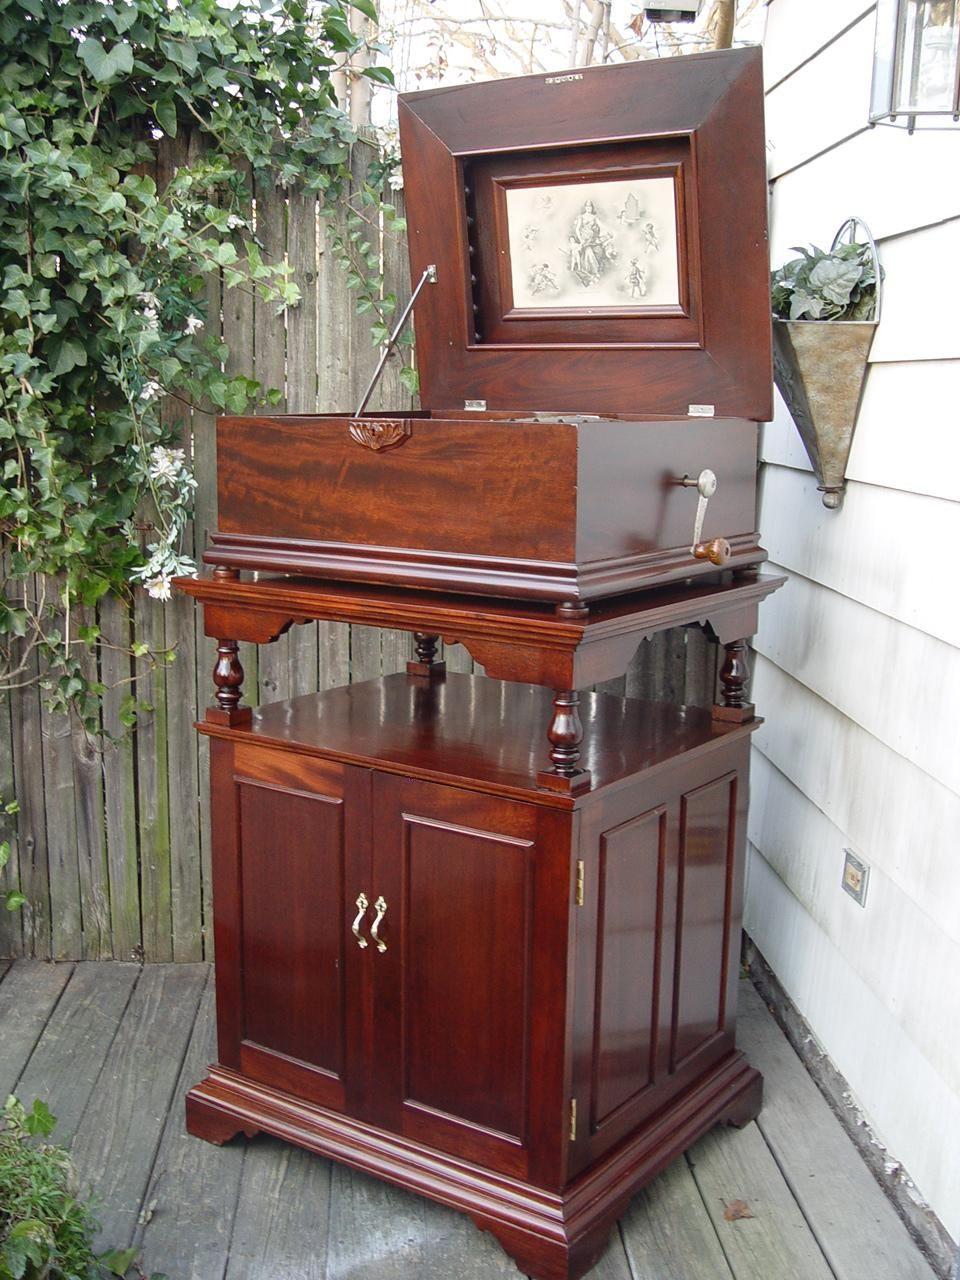 Regina Music Box Official Site To Buy Sell Repair Restoration Of Any Antique Regina Music Box Al Meekins Antiq Antique Music Box Music Box Music Machine